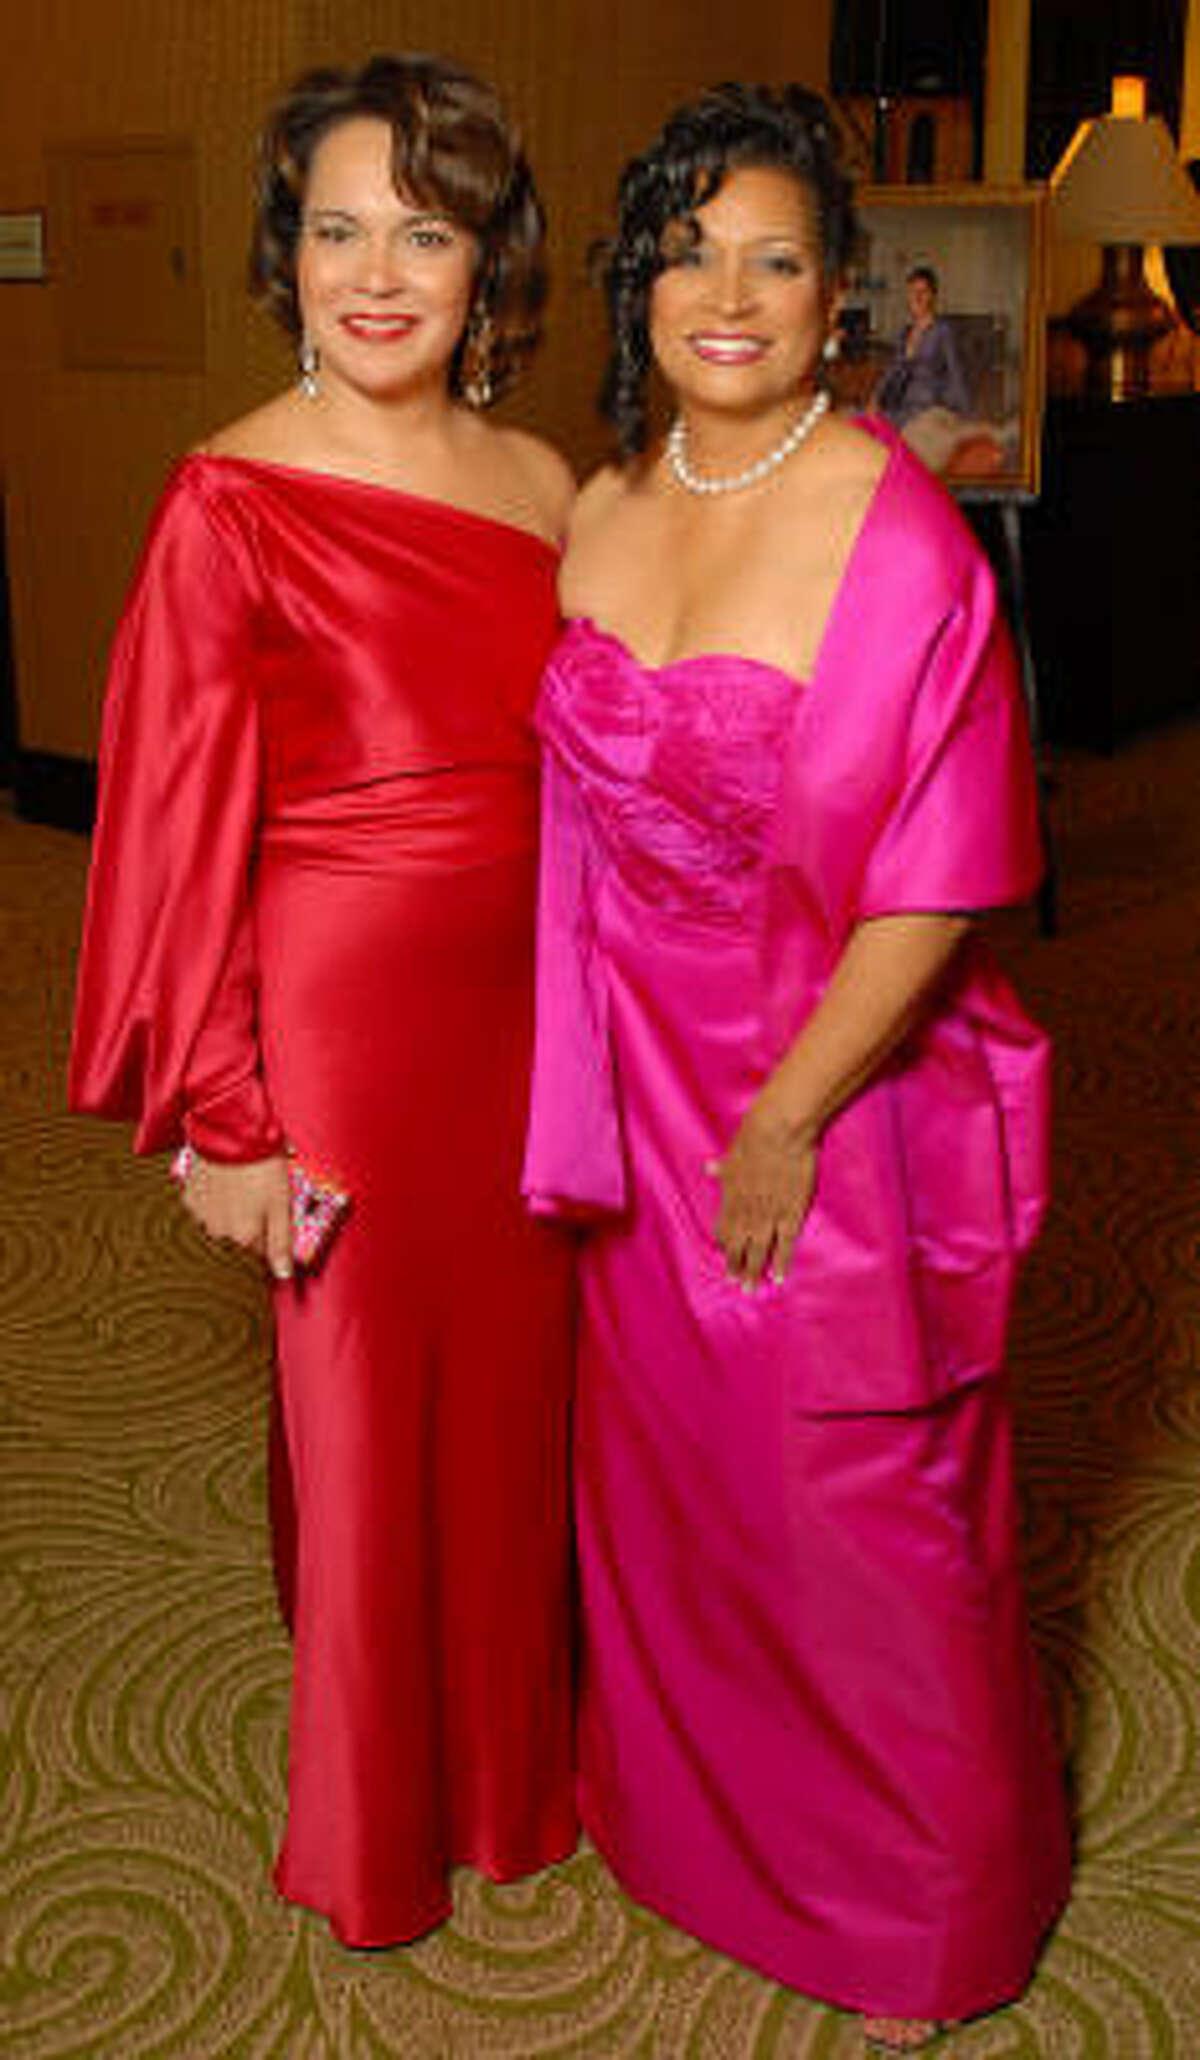 Honorees Rosi Hernendez, left, and Cheryl Moore McNair